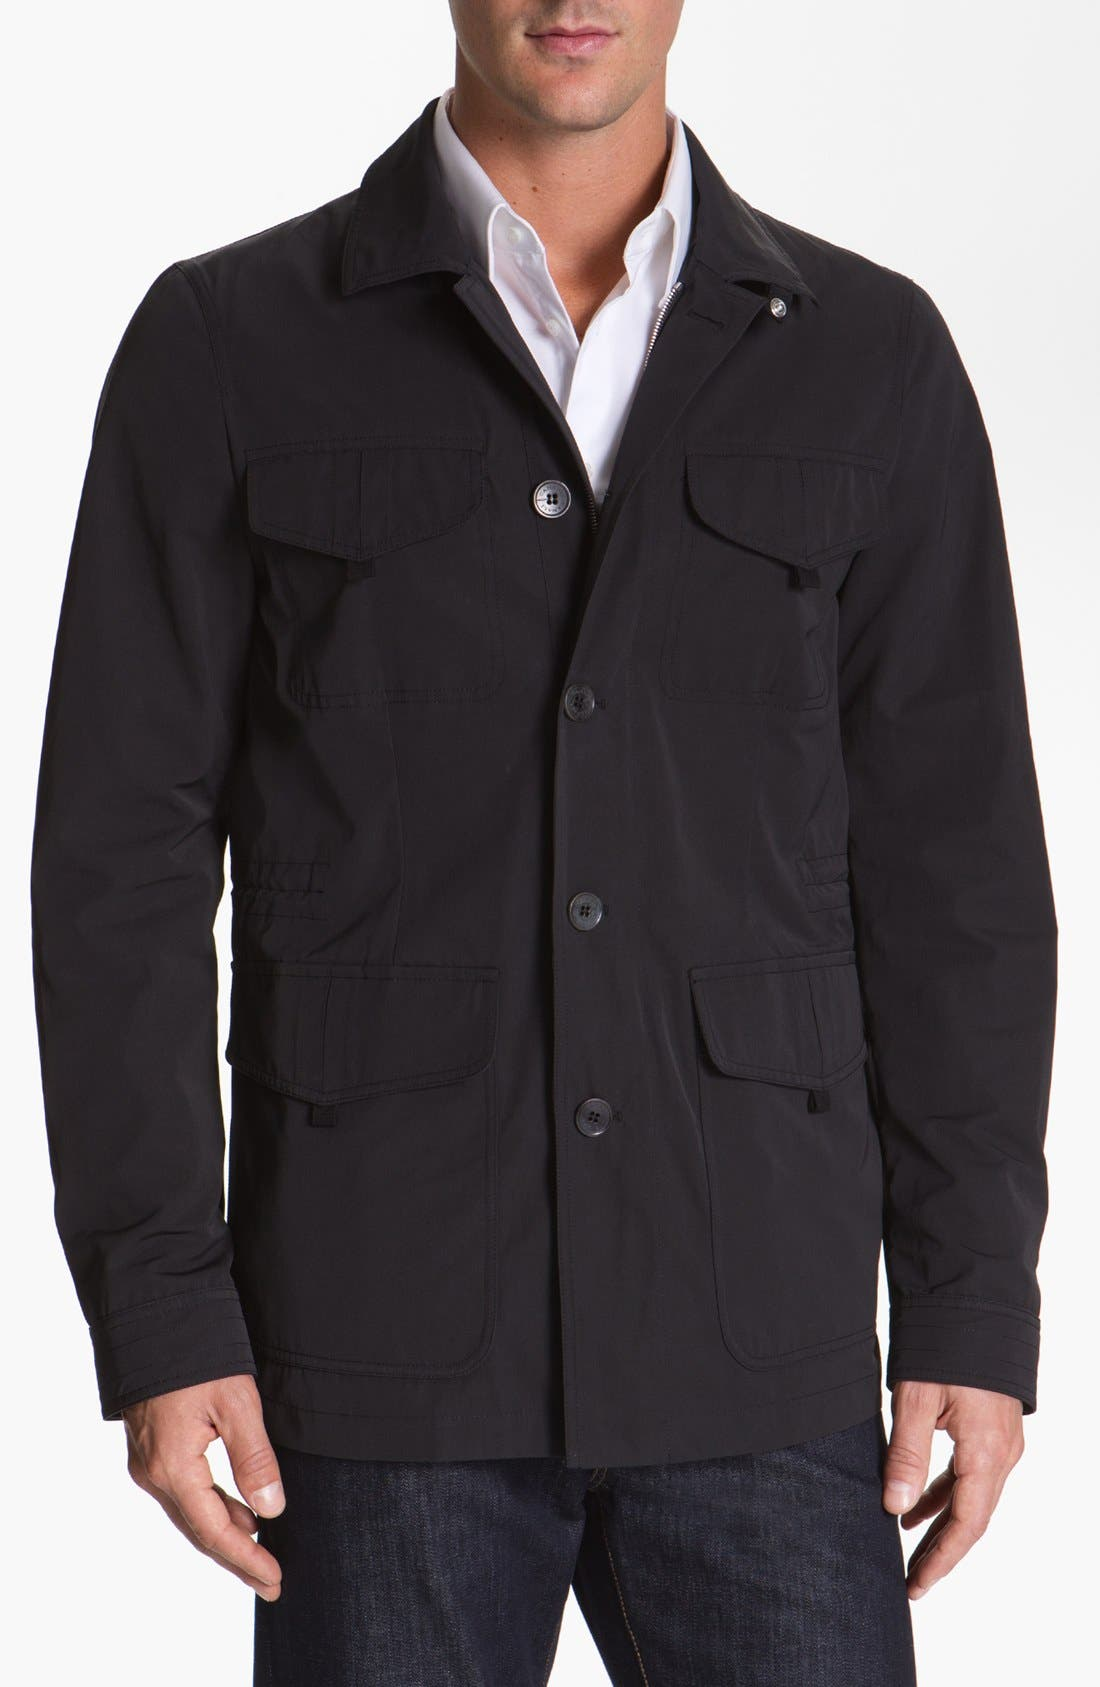 Alternate Image 1 Selected - Canali Tech Jacket